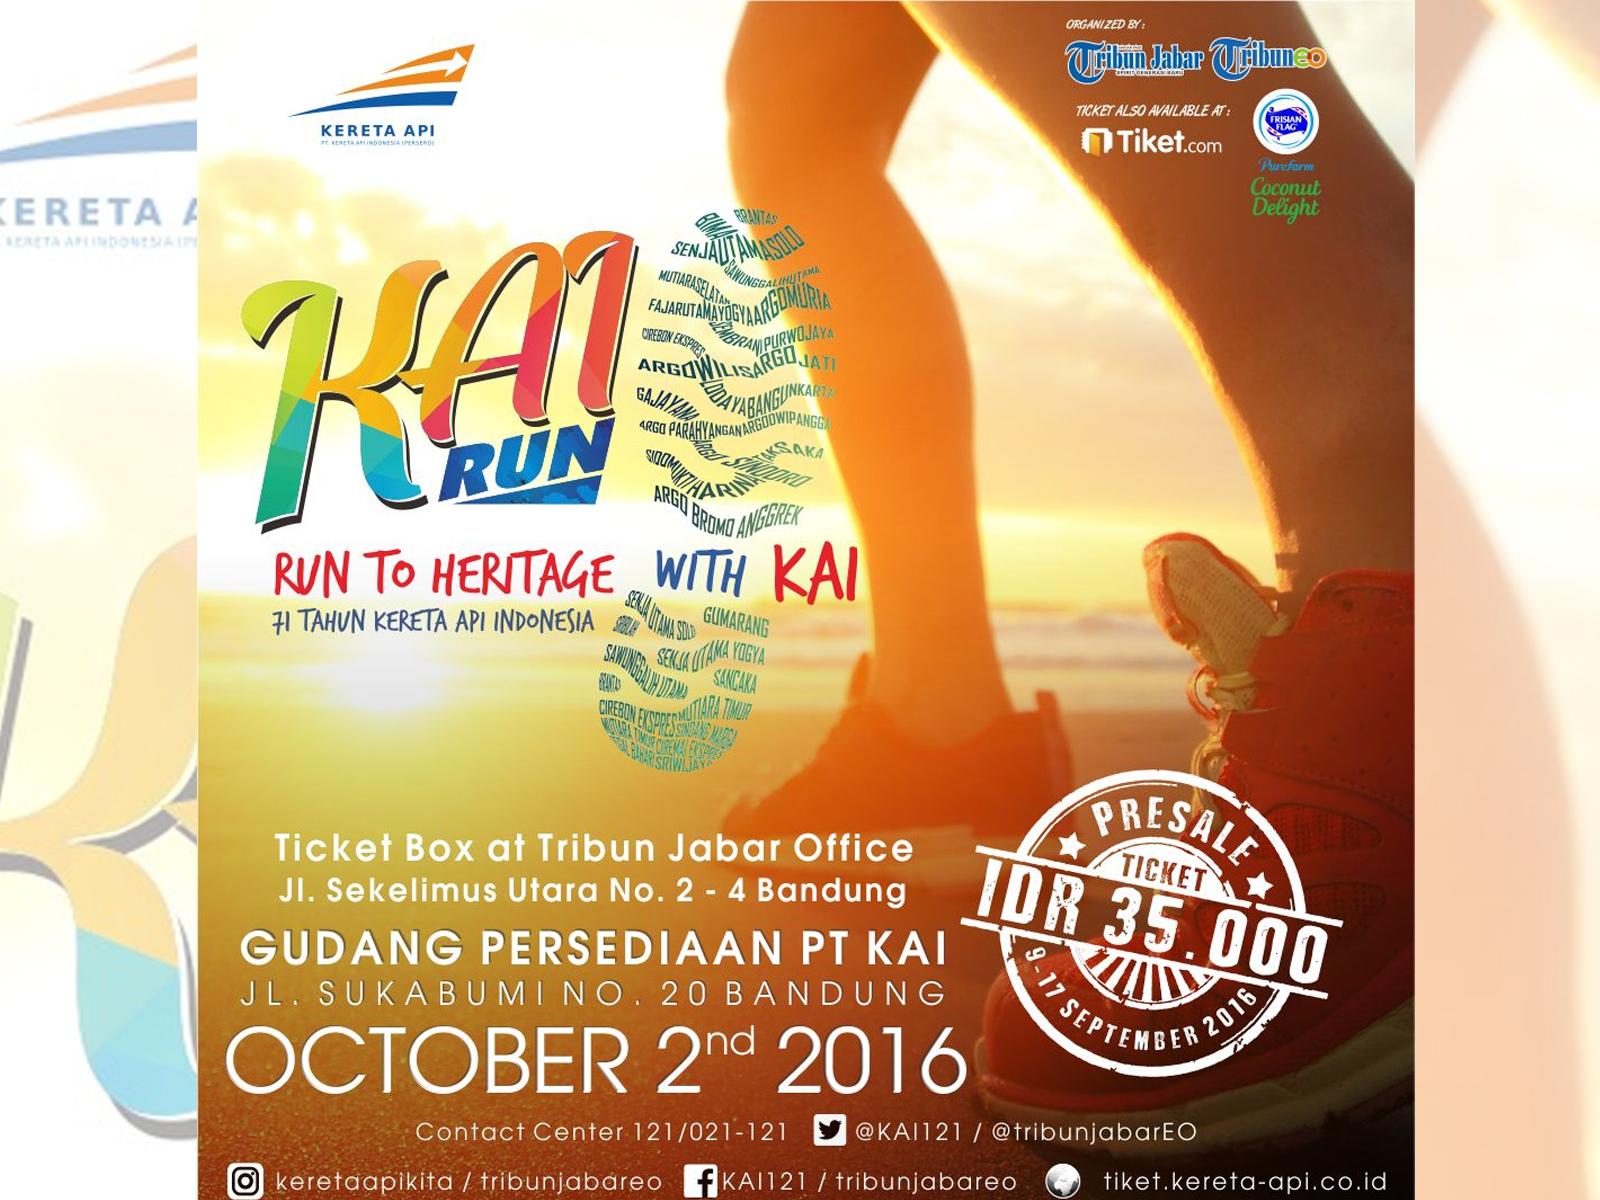 Event KAI Run 2 Oktober 2016 Bandung